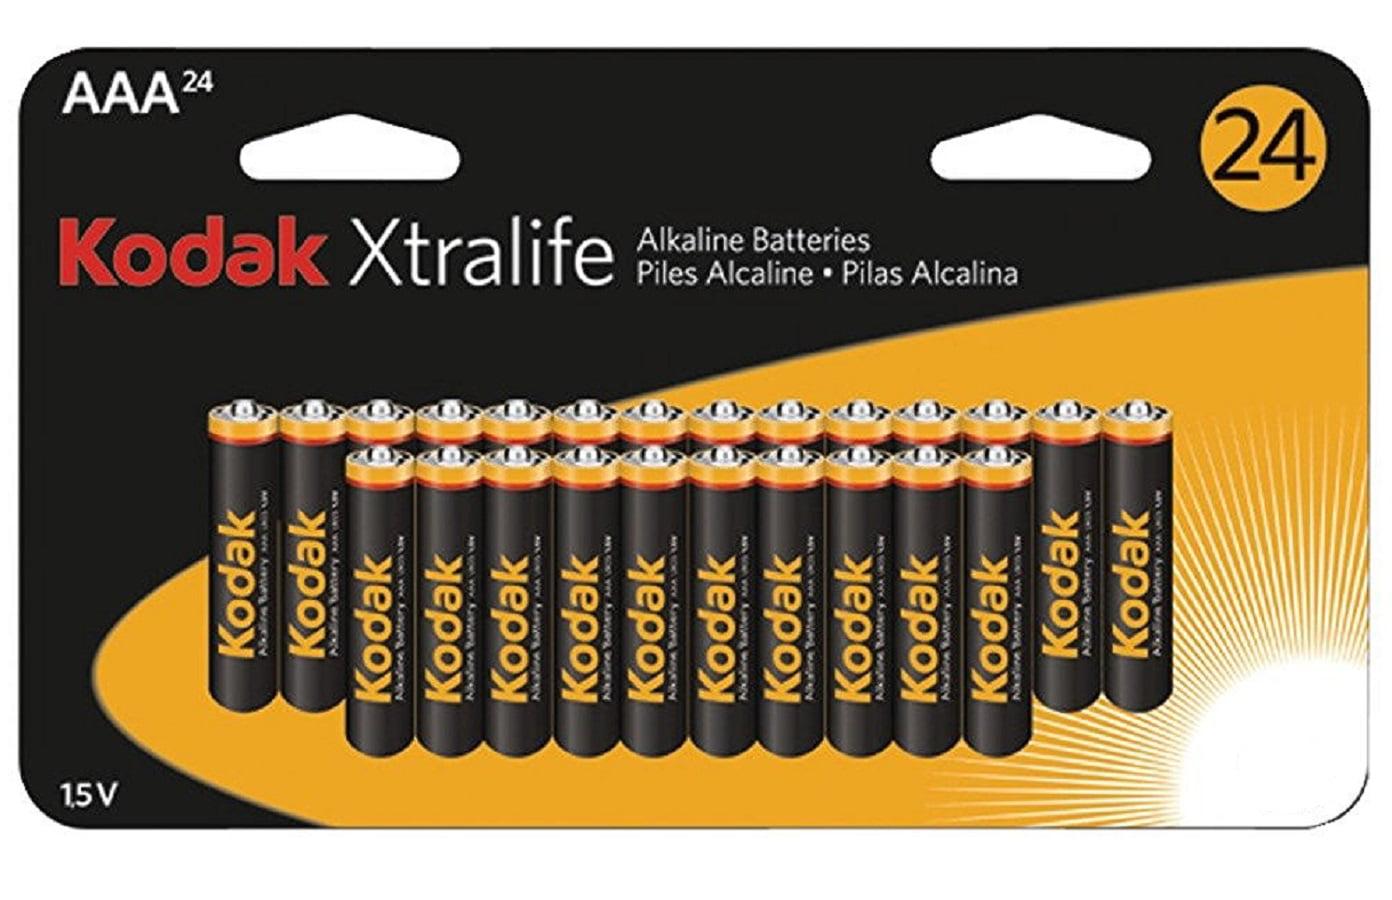 Kodak Xtralife K3a 24 Alkaline Batteries Aaa 24 Pk Walmart Com Walmart Com